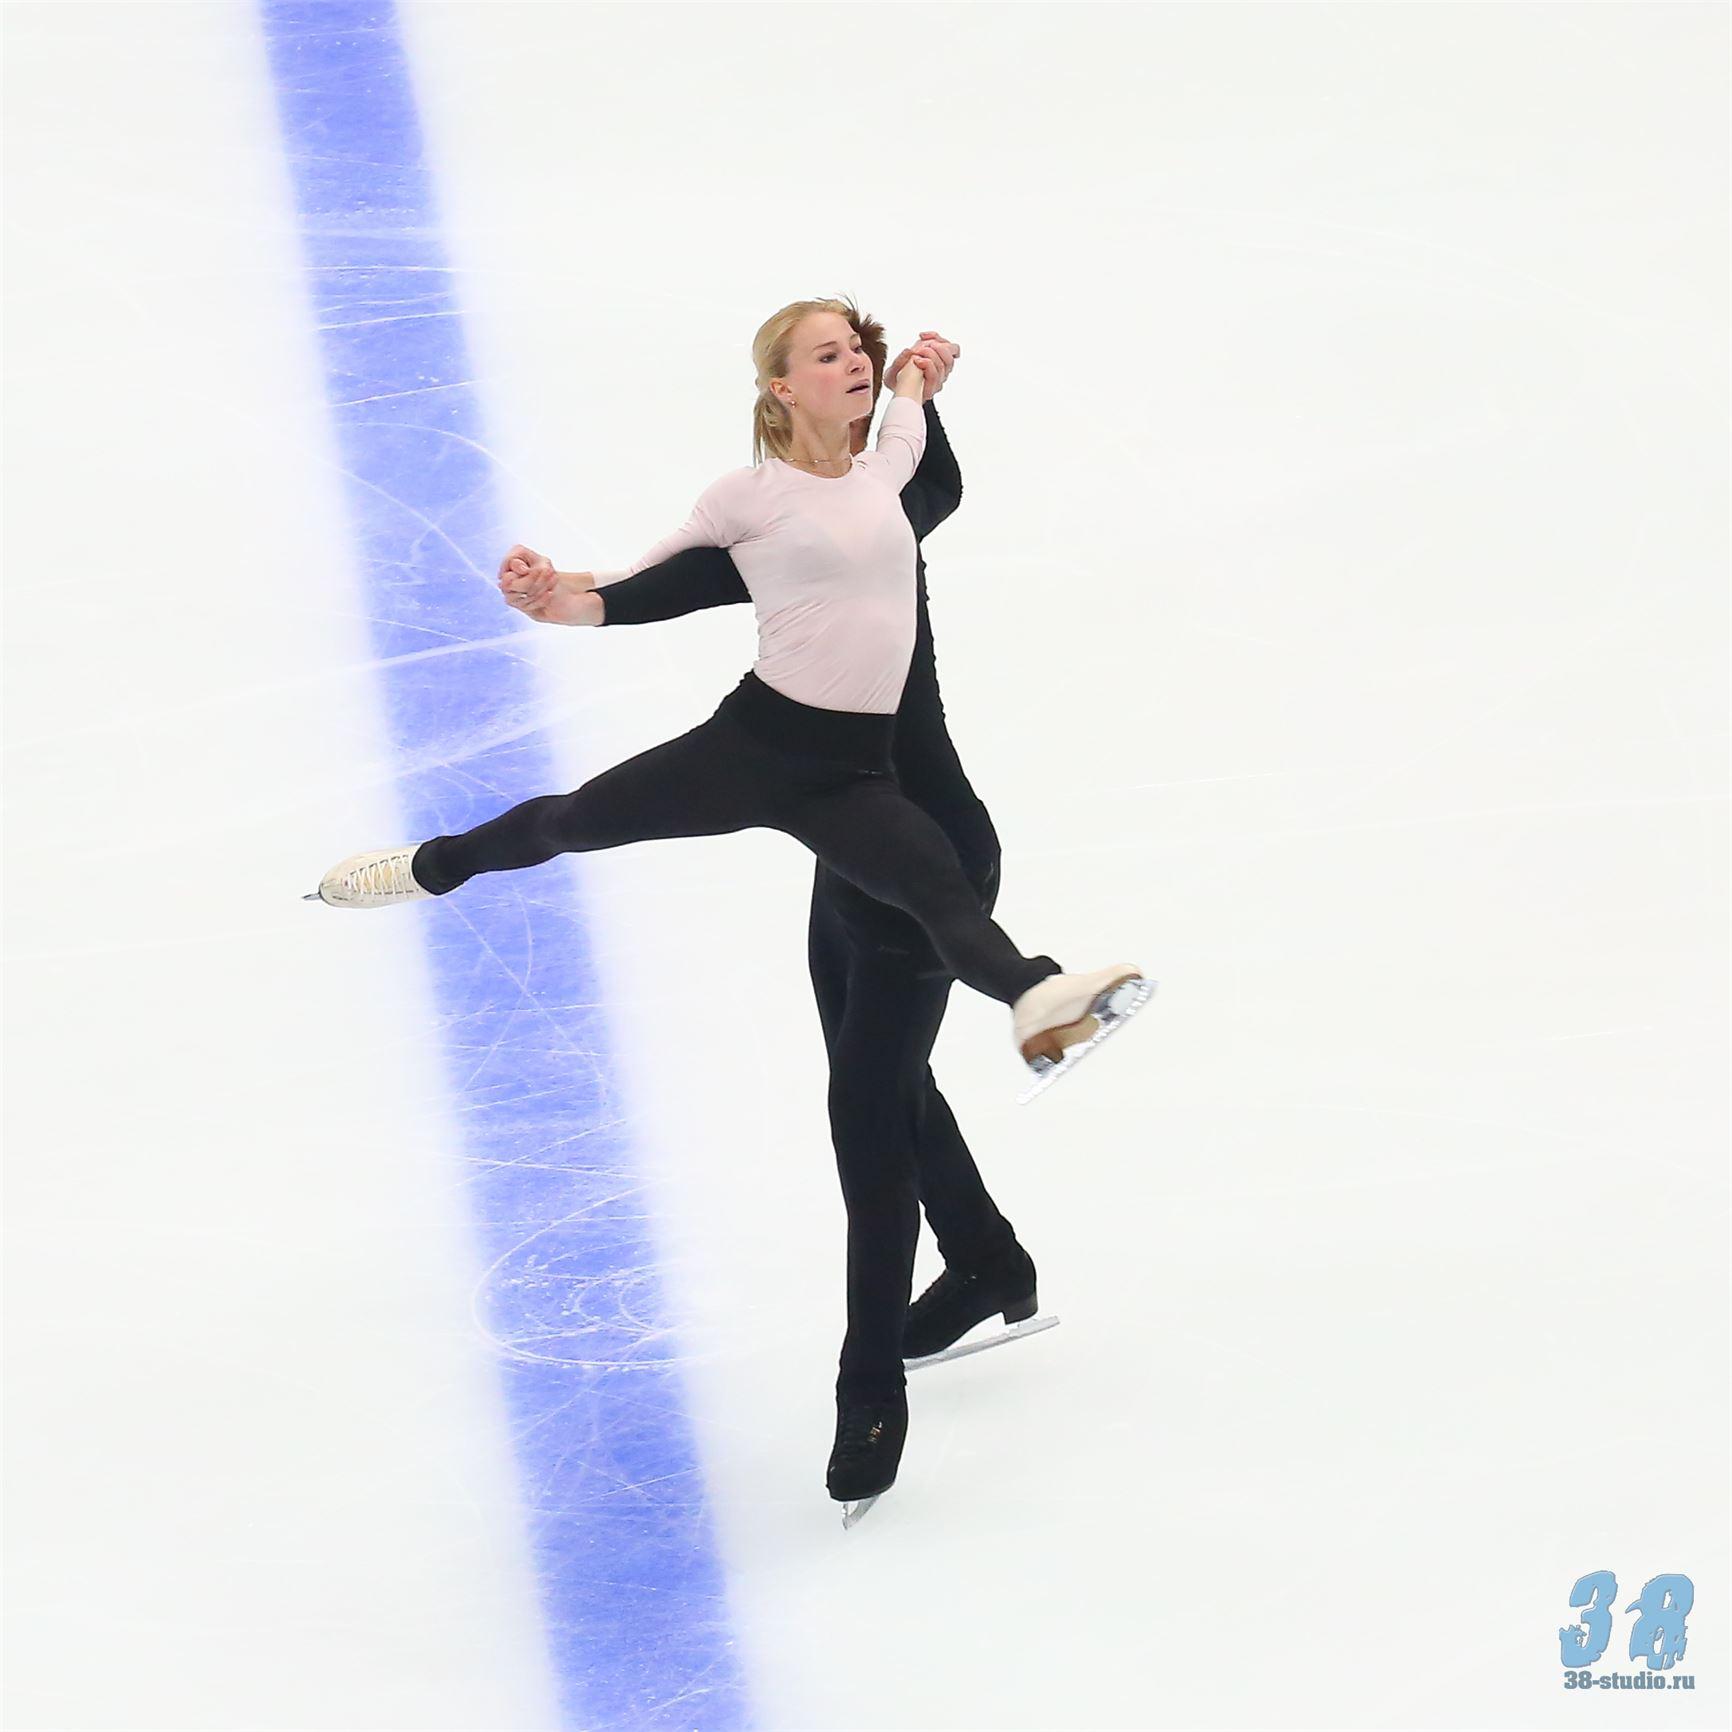 Евгения Тарасова - Владимир Морозов-2 - Страница 14 SvLvoT9TFaM